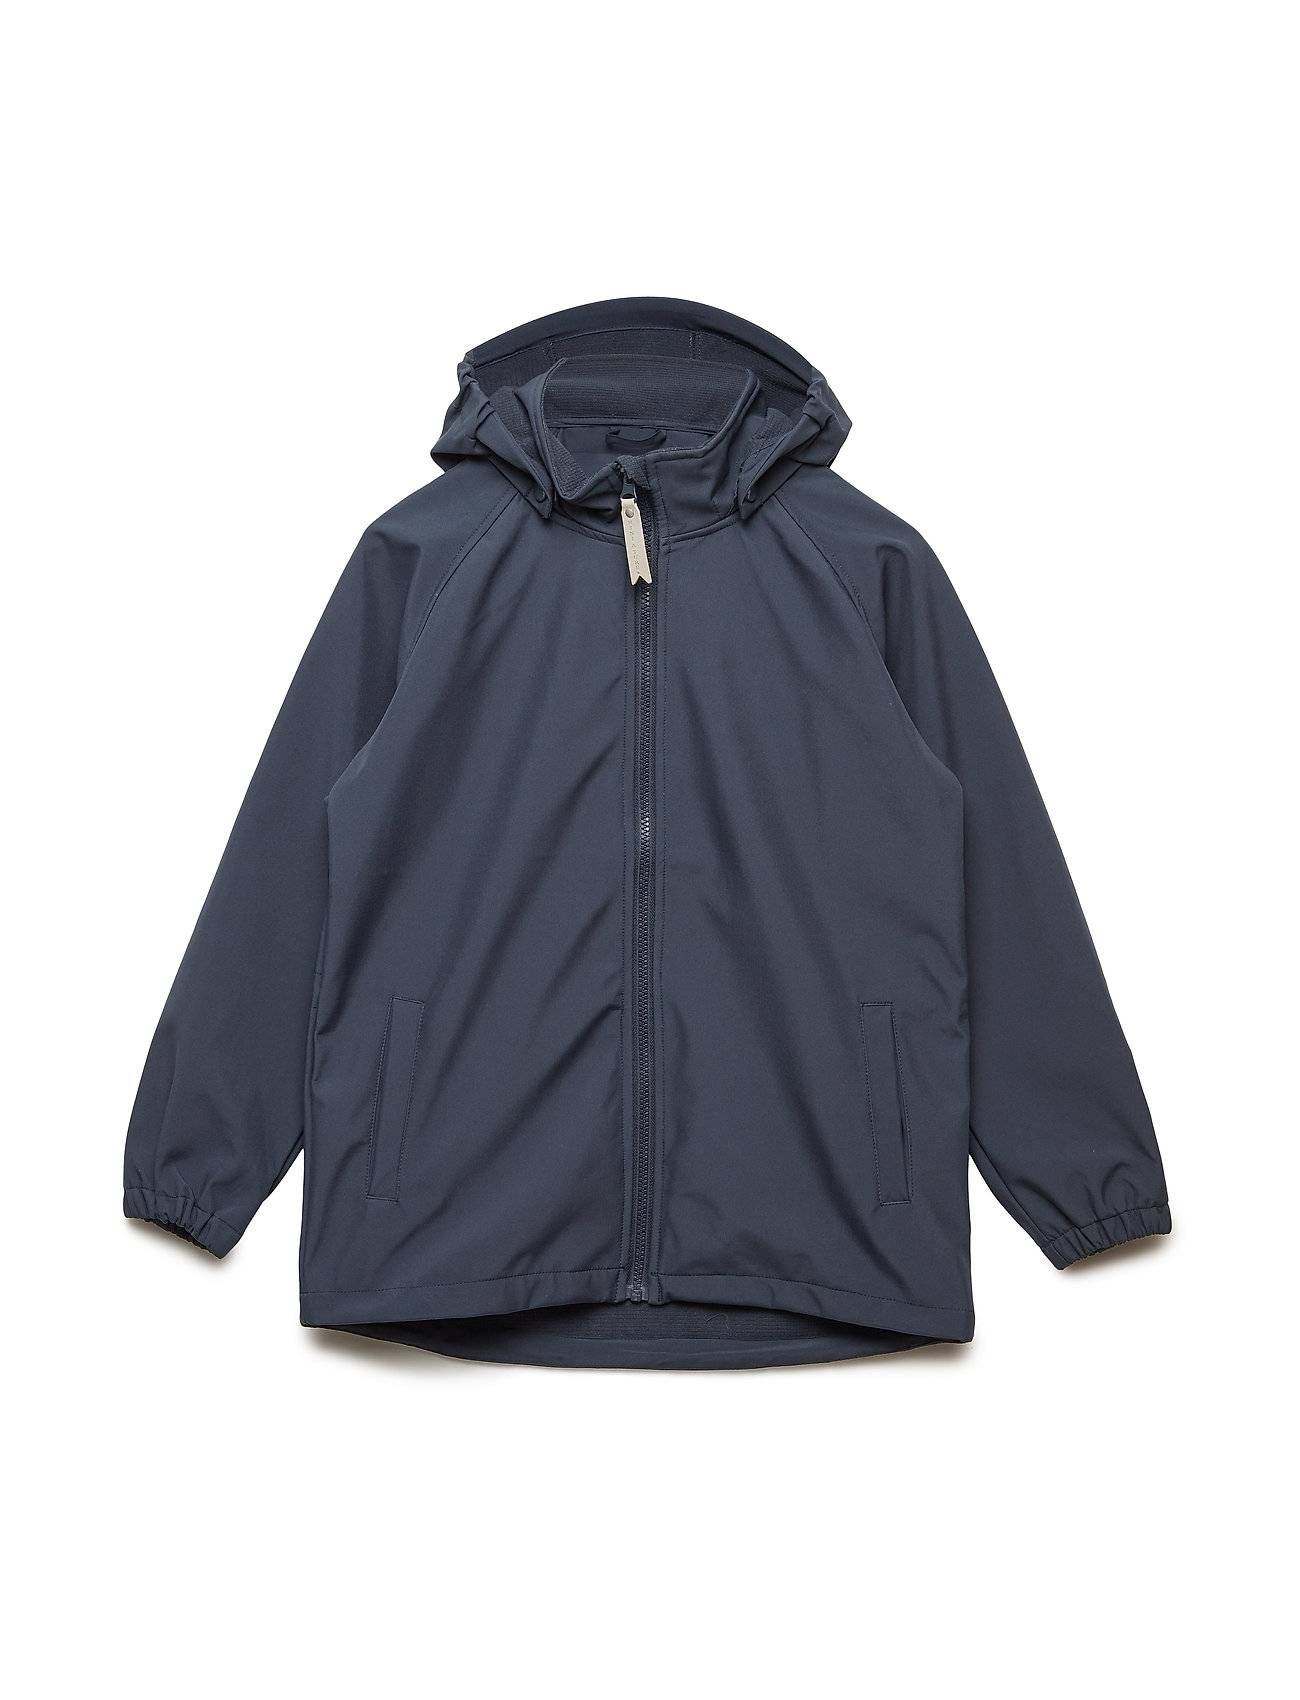 Mini A Ture Aden Jacket, Mk